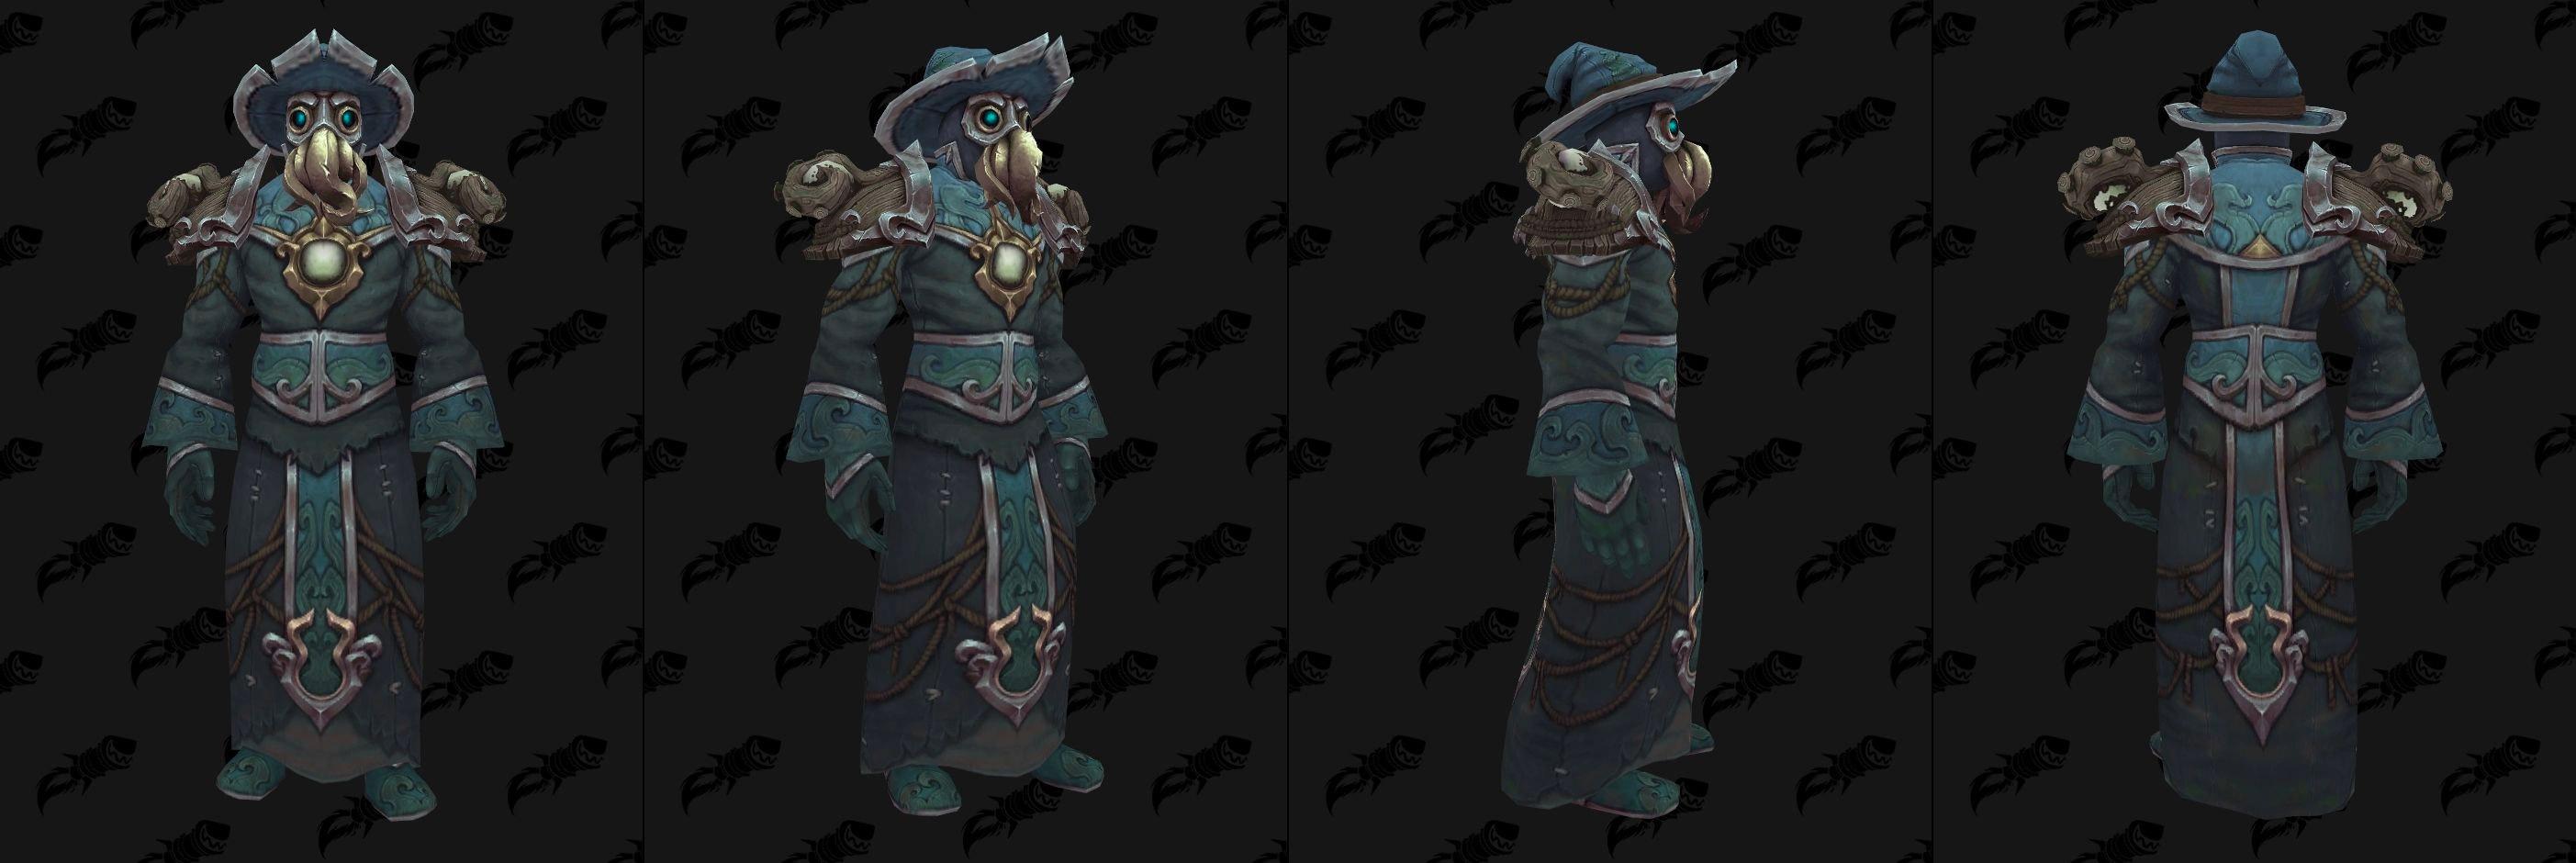 Set d'armures en tissus Kul Tiras (Donjon) - Coloris 2